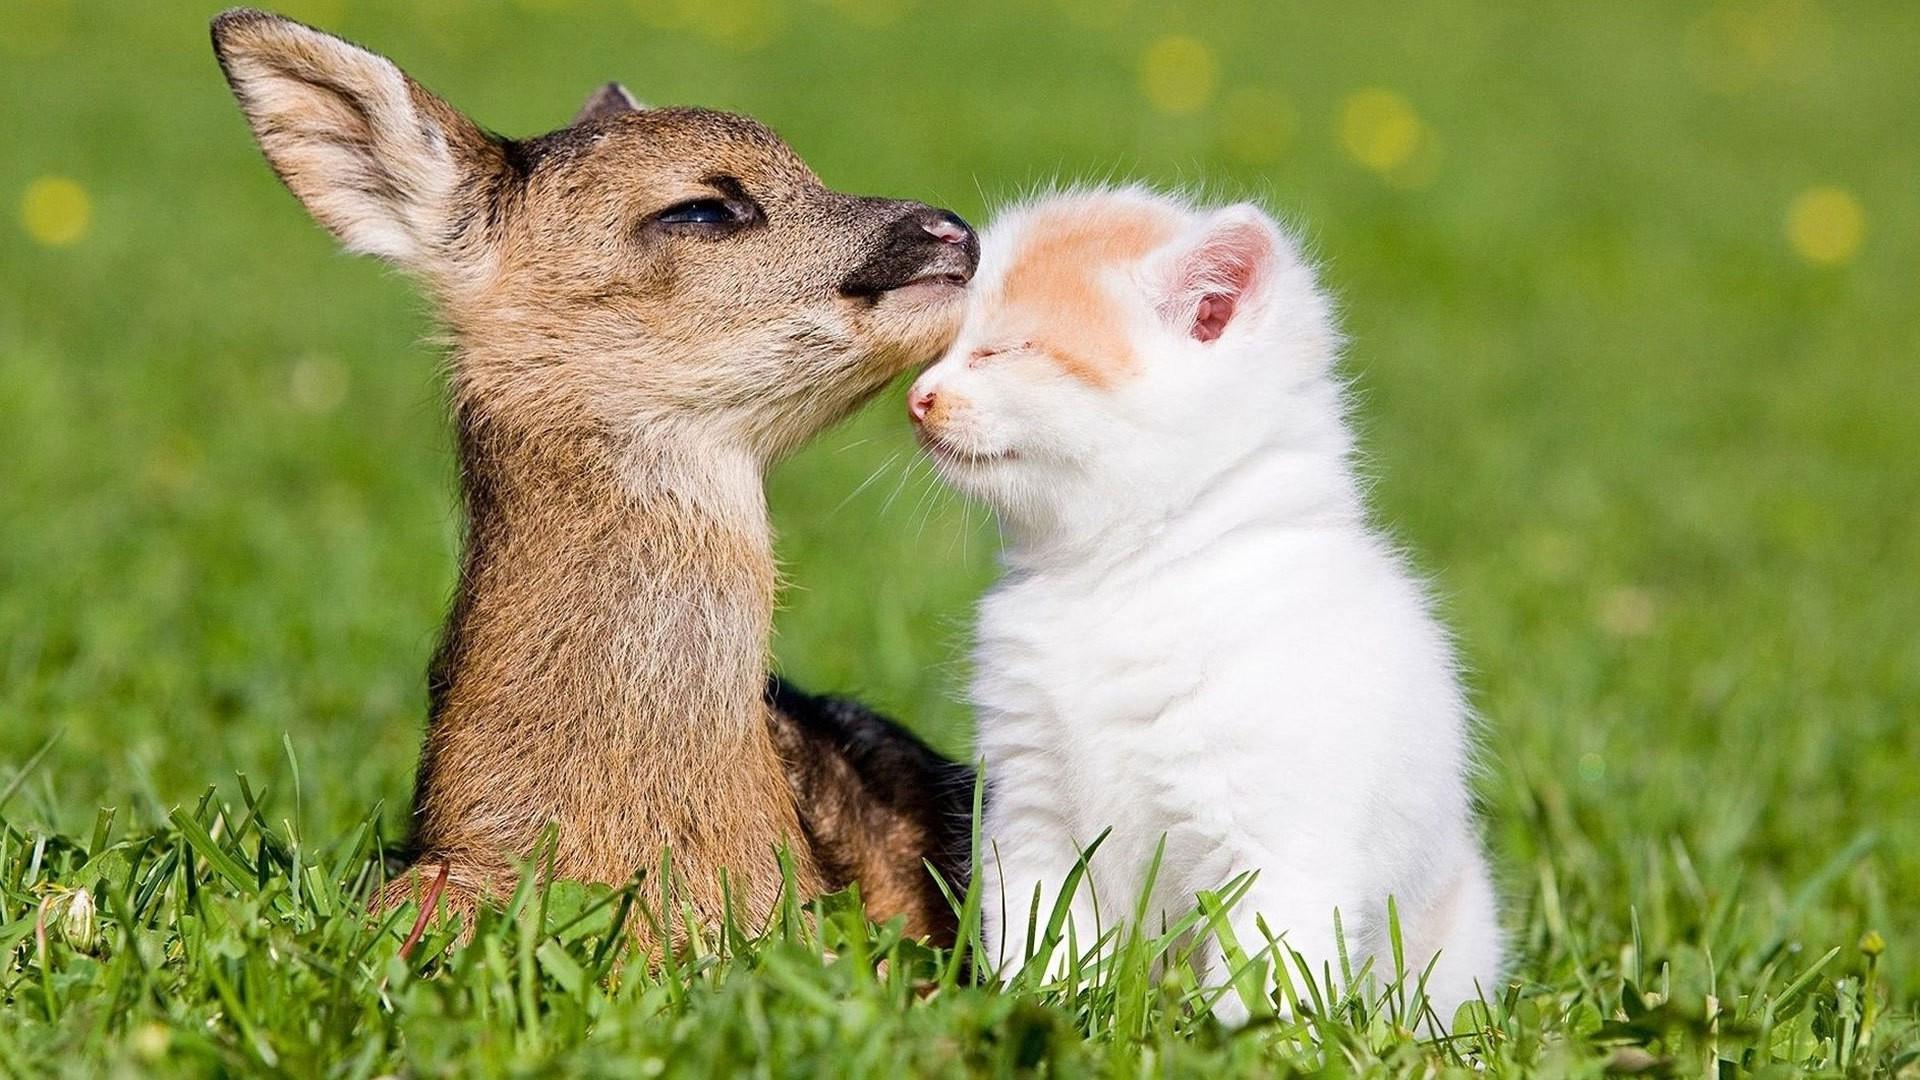 Cute Animal High Quality